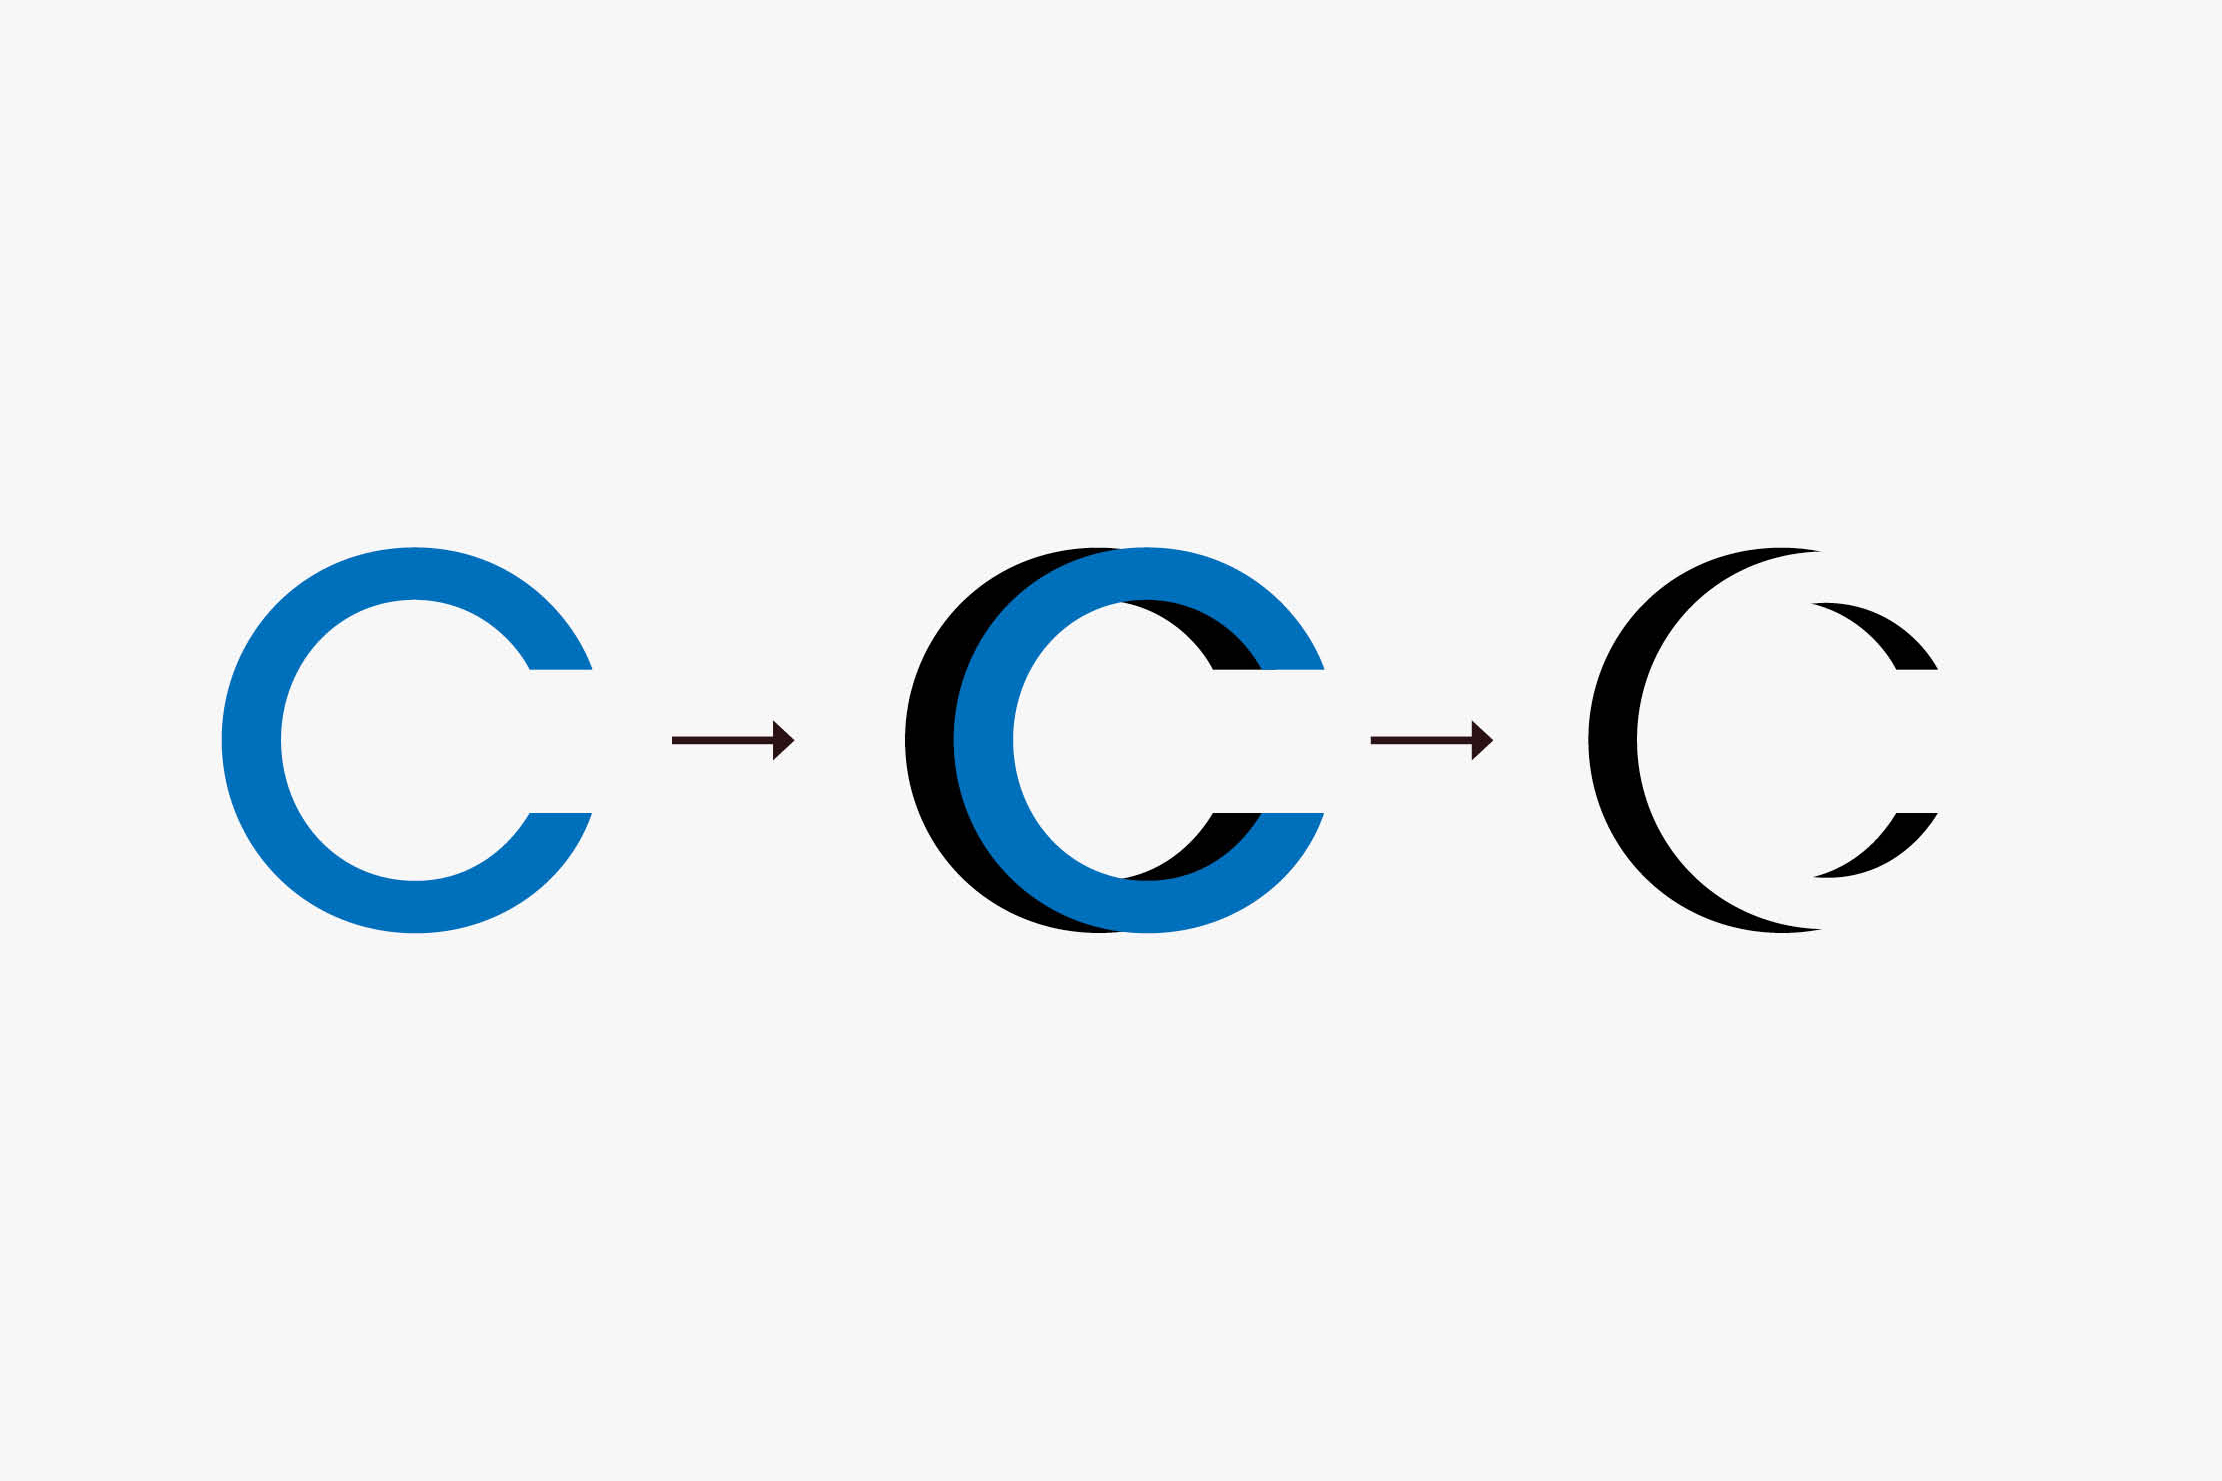 Bitflow-studio-carla-logo-design-concept